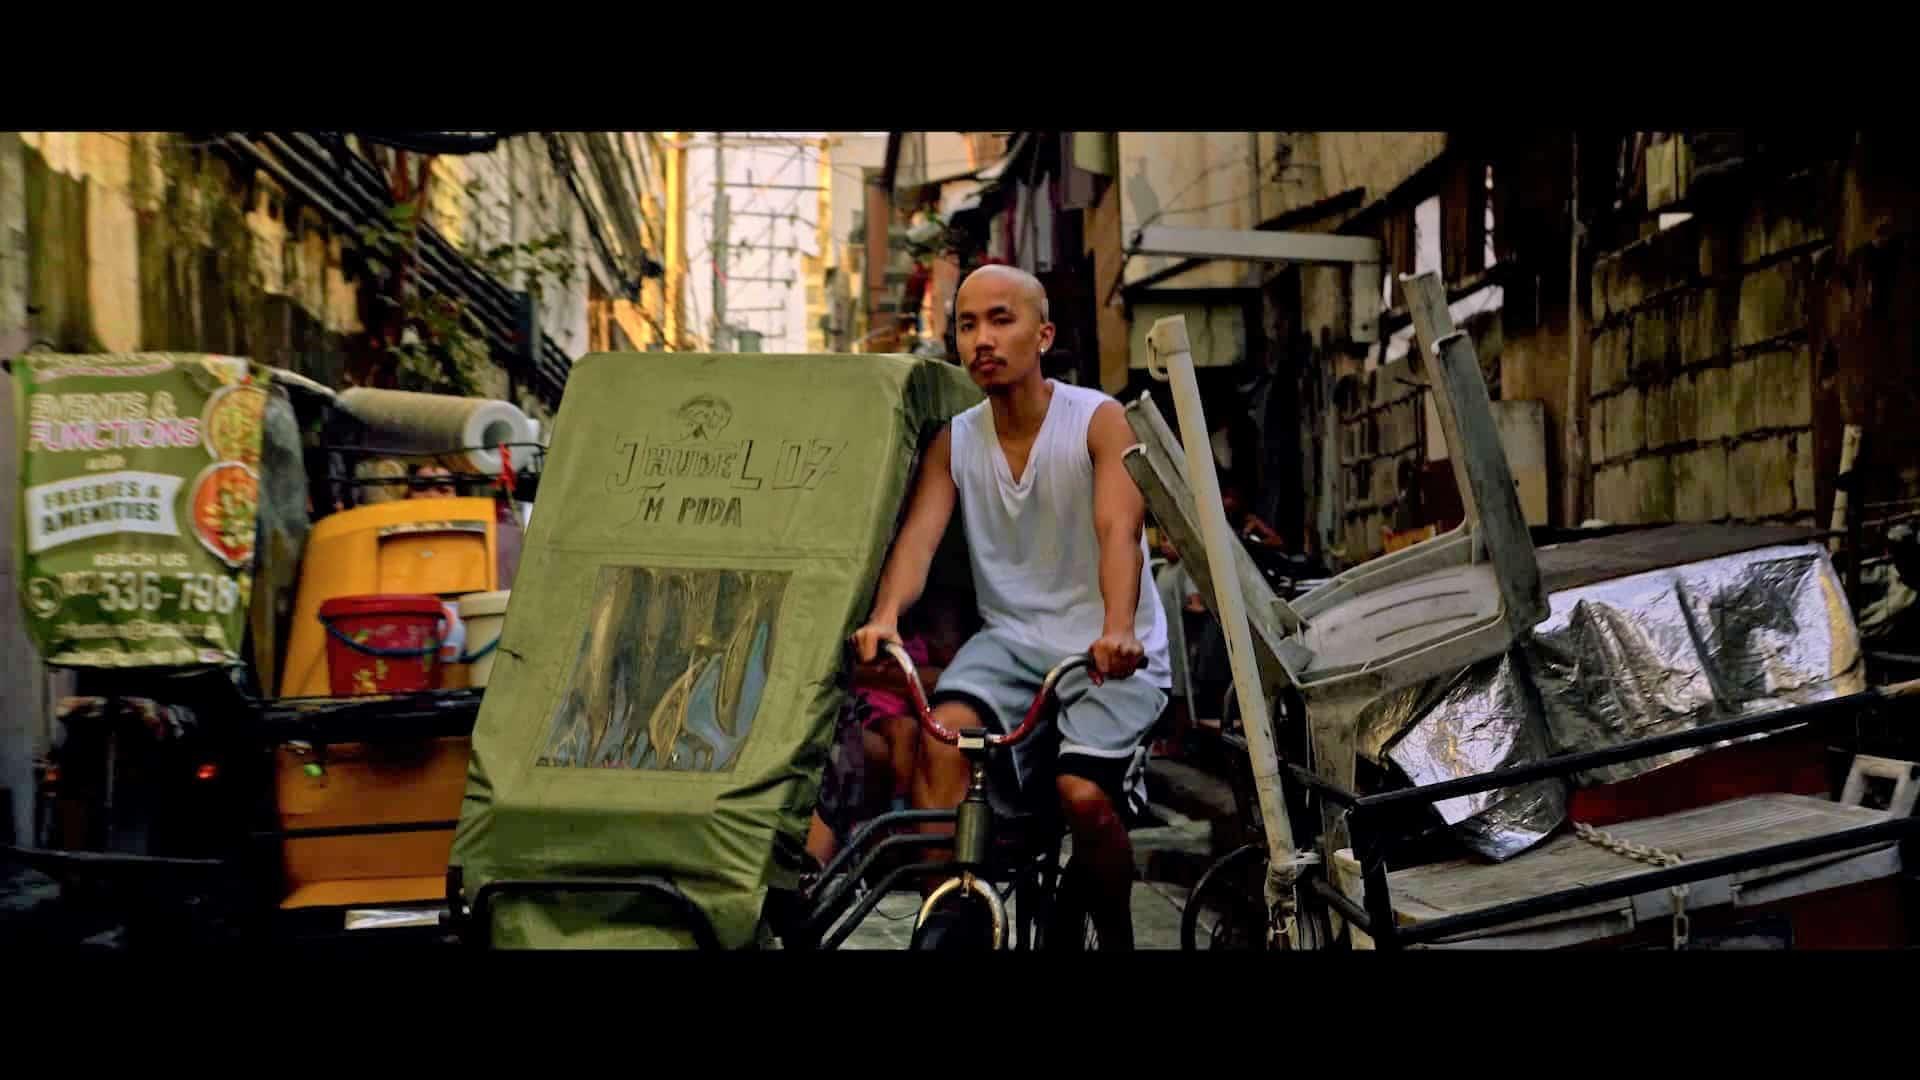 Arvin Belarmino's Life's Pedal